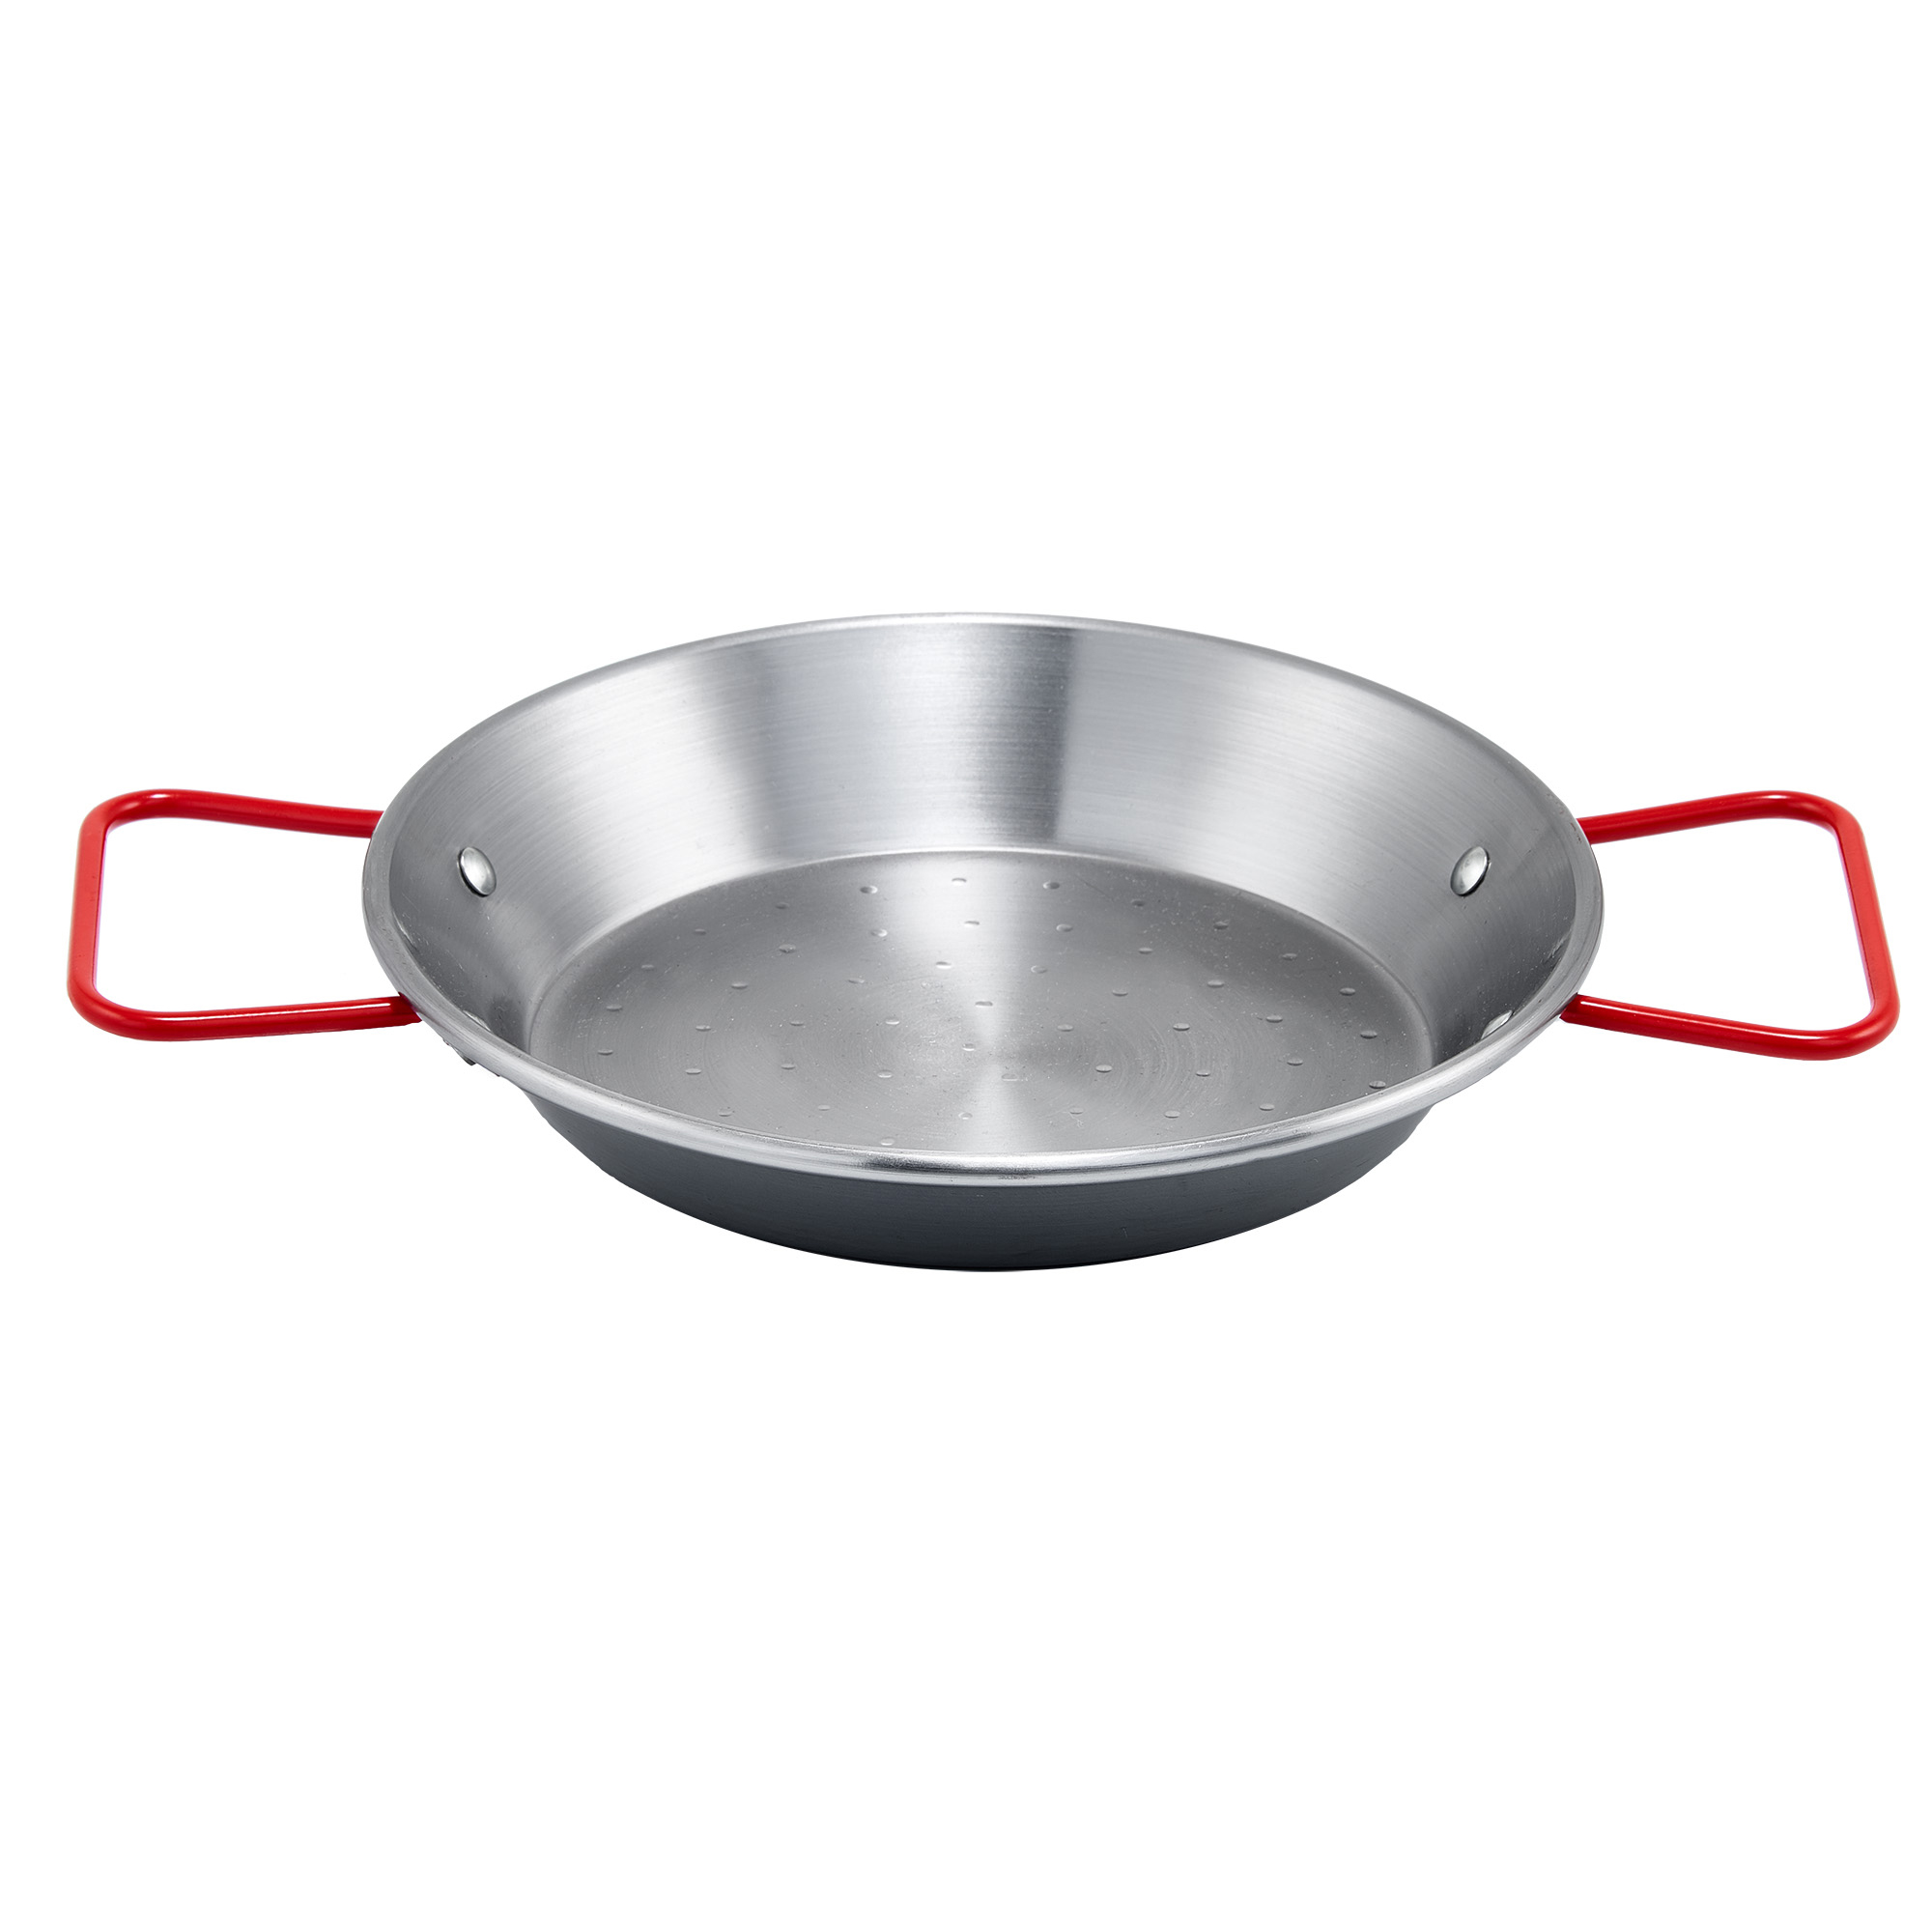 1150-24 Winco CSPP-14 paella pan